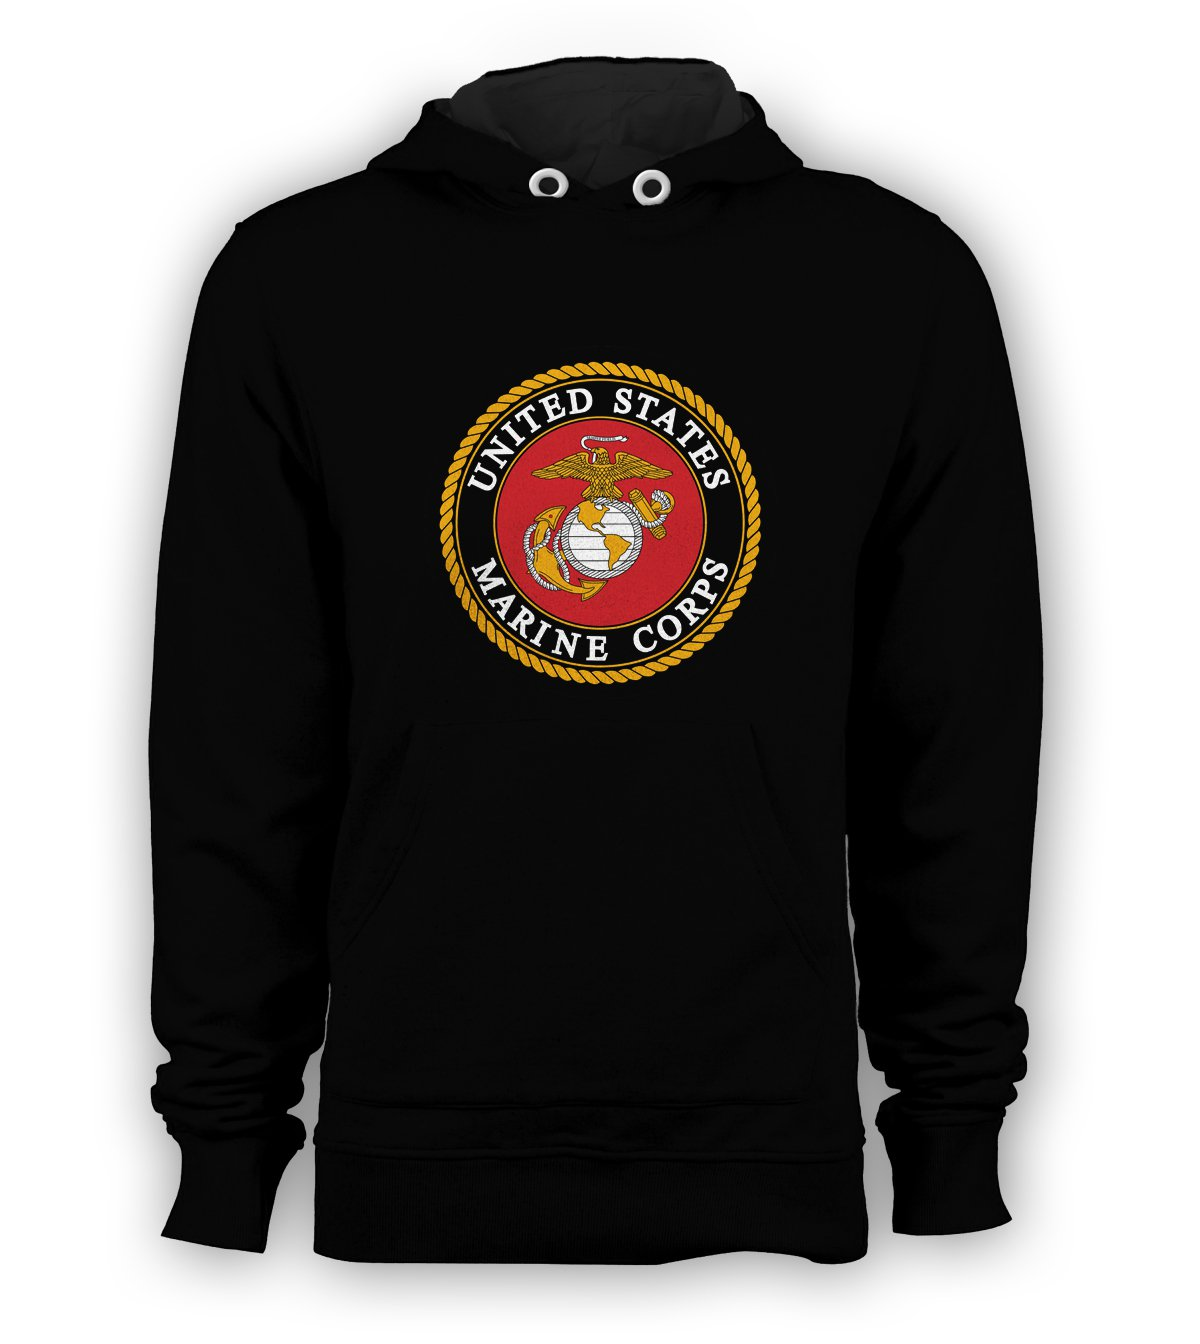 US Marine Corps USMC Pullover Hoodie Men Sweatshirts Size S to 3XL New Black